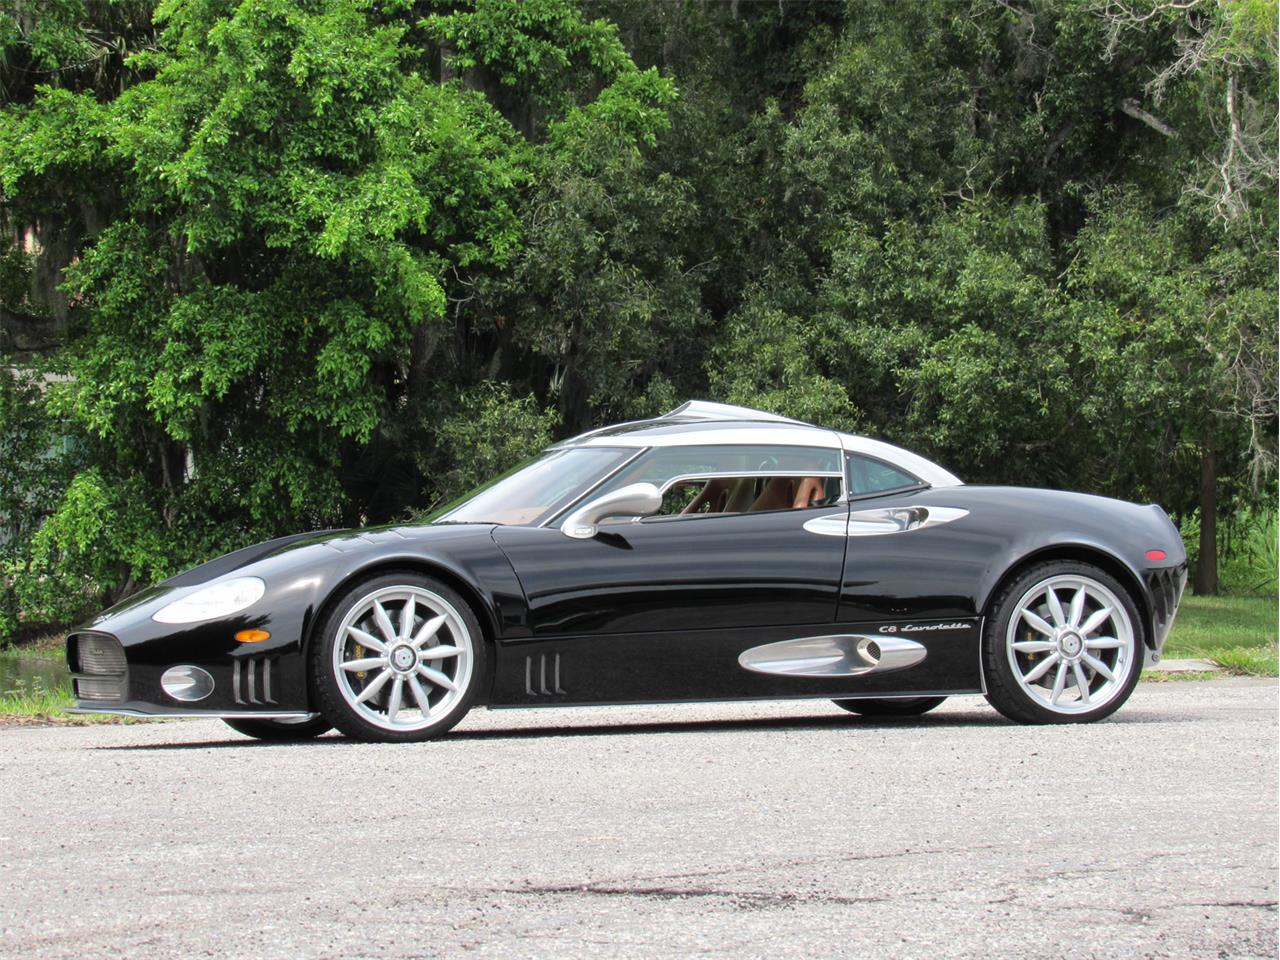 2009 Spyker C8 (CC-1236455) for sale in Sarasota, Florida